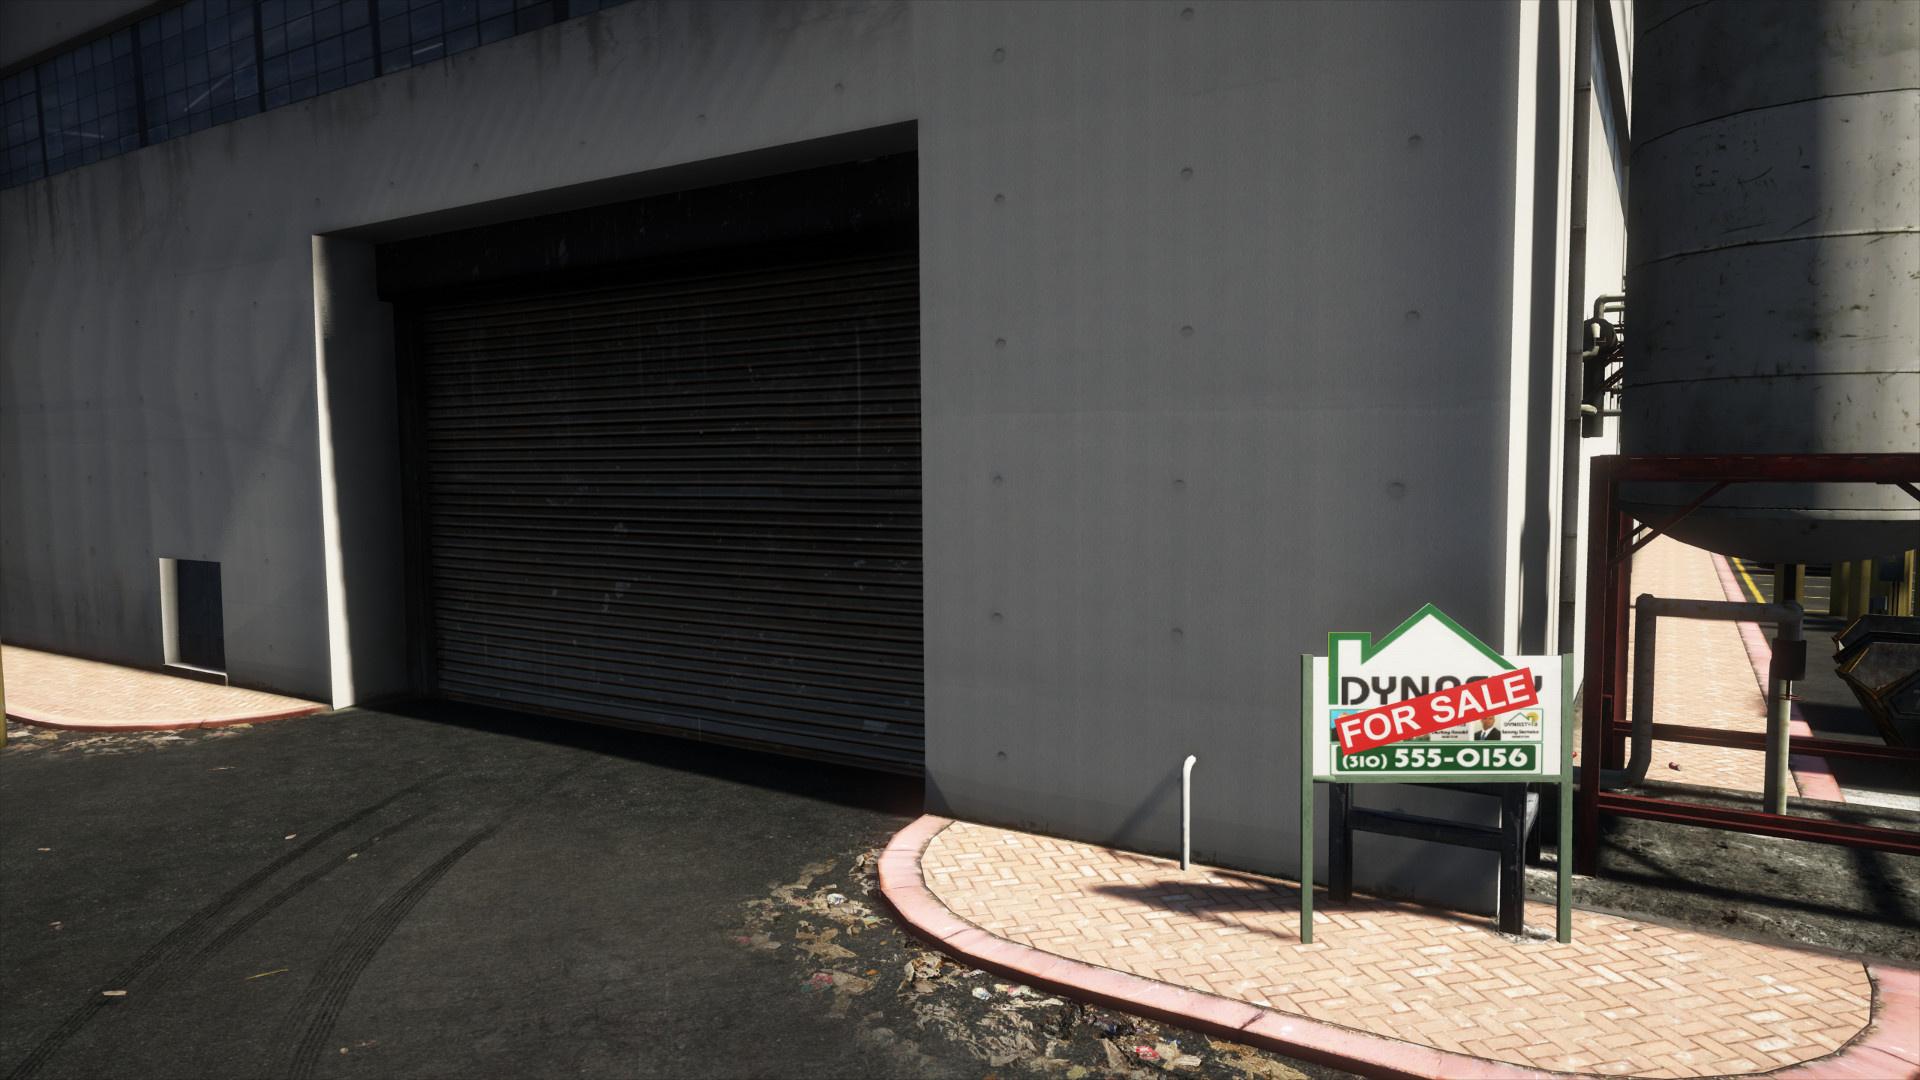 gta 5 best vehicle warehouse location